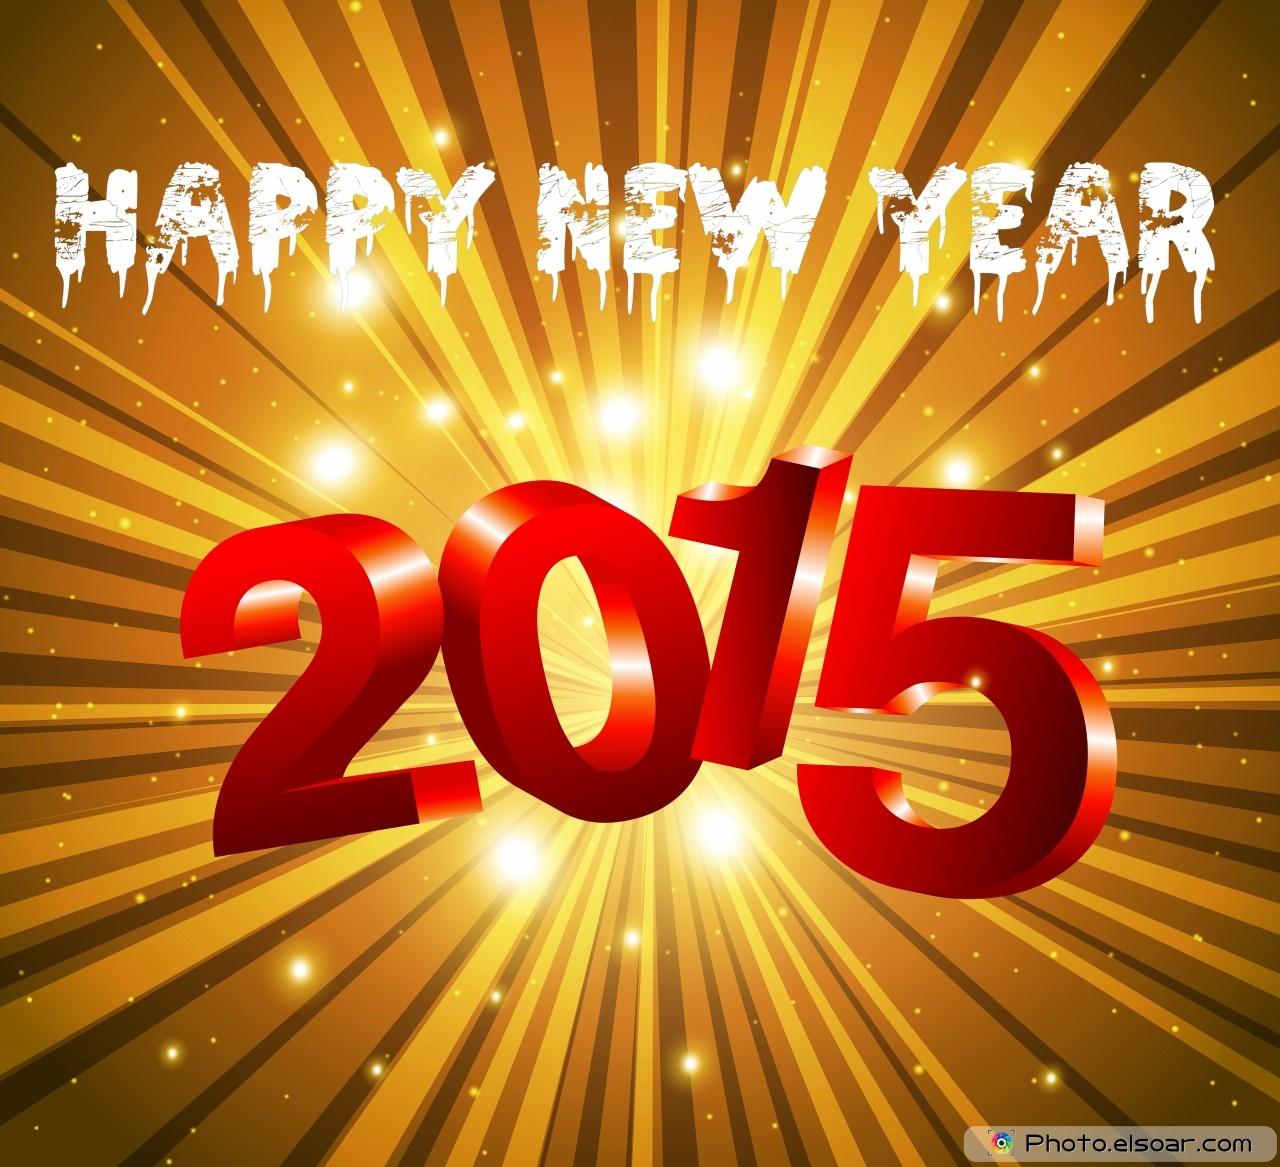 Happy New Year 2015 HD Wallpapers Elsoar 1280x1167